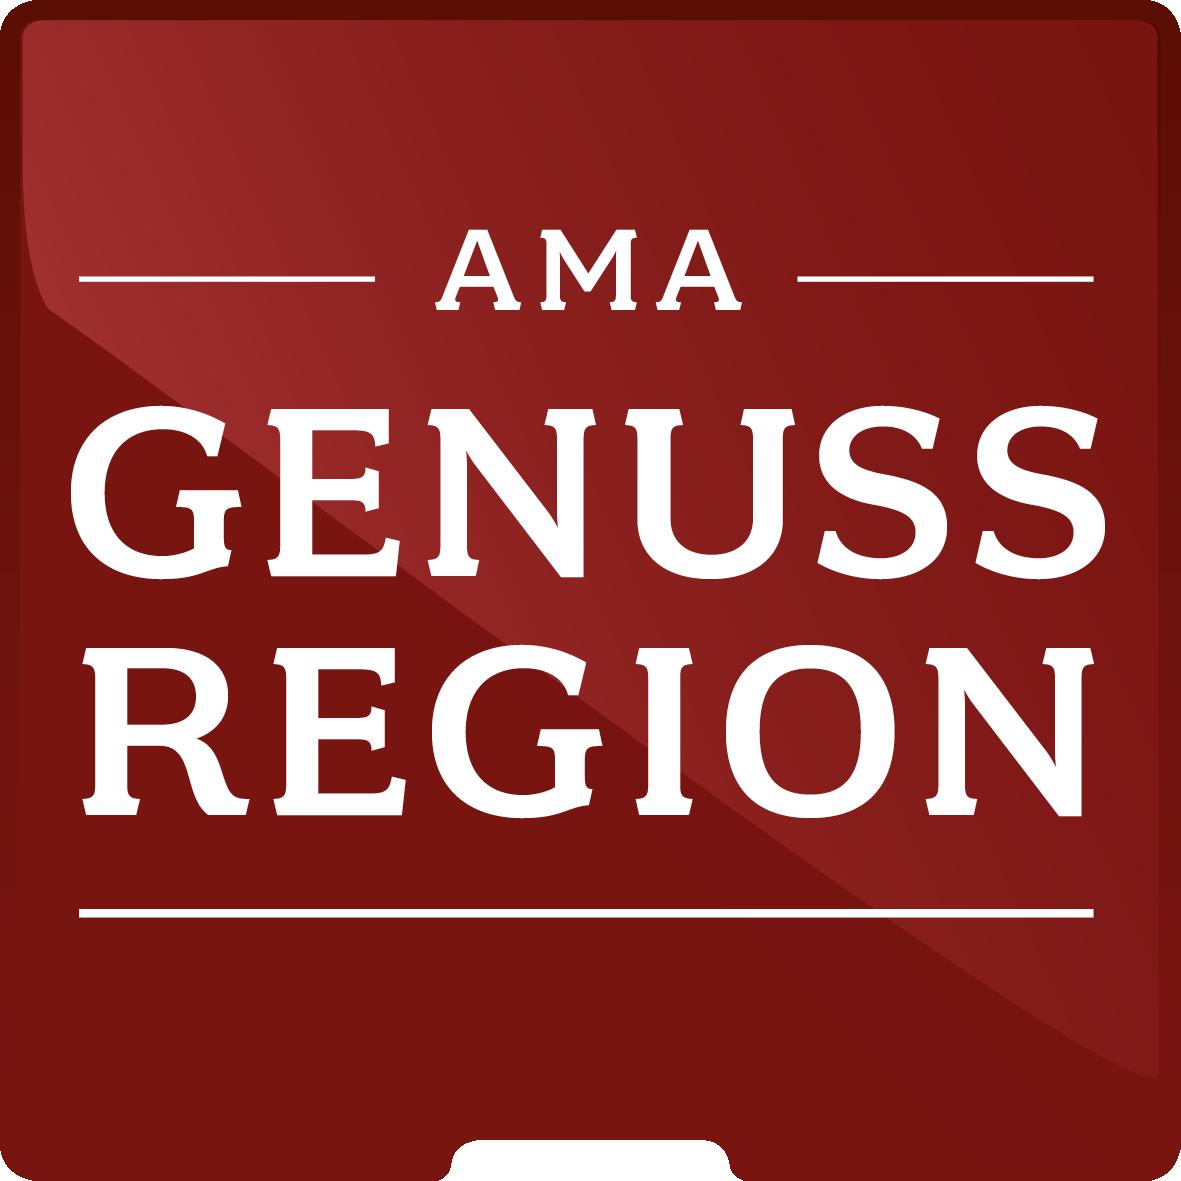 AMA_Genuss-Region Siegel